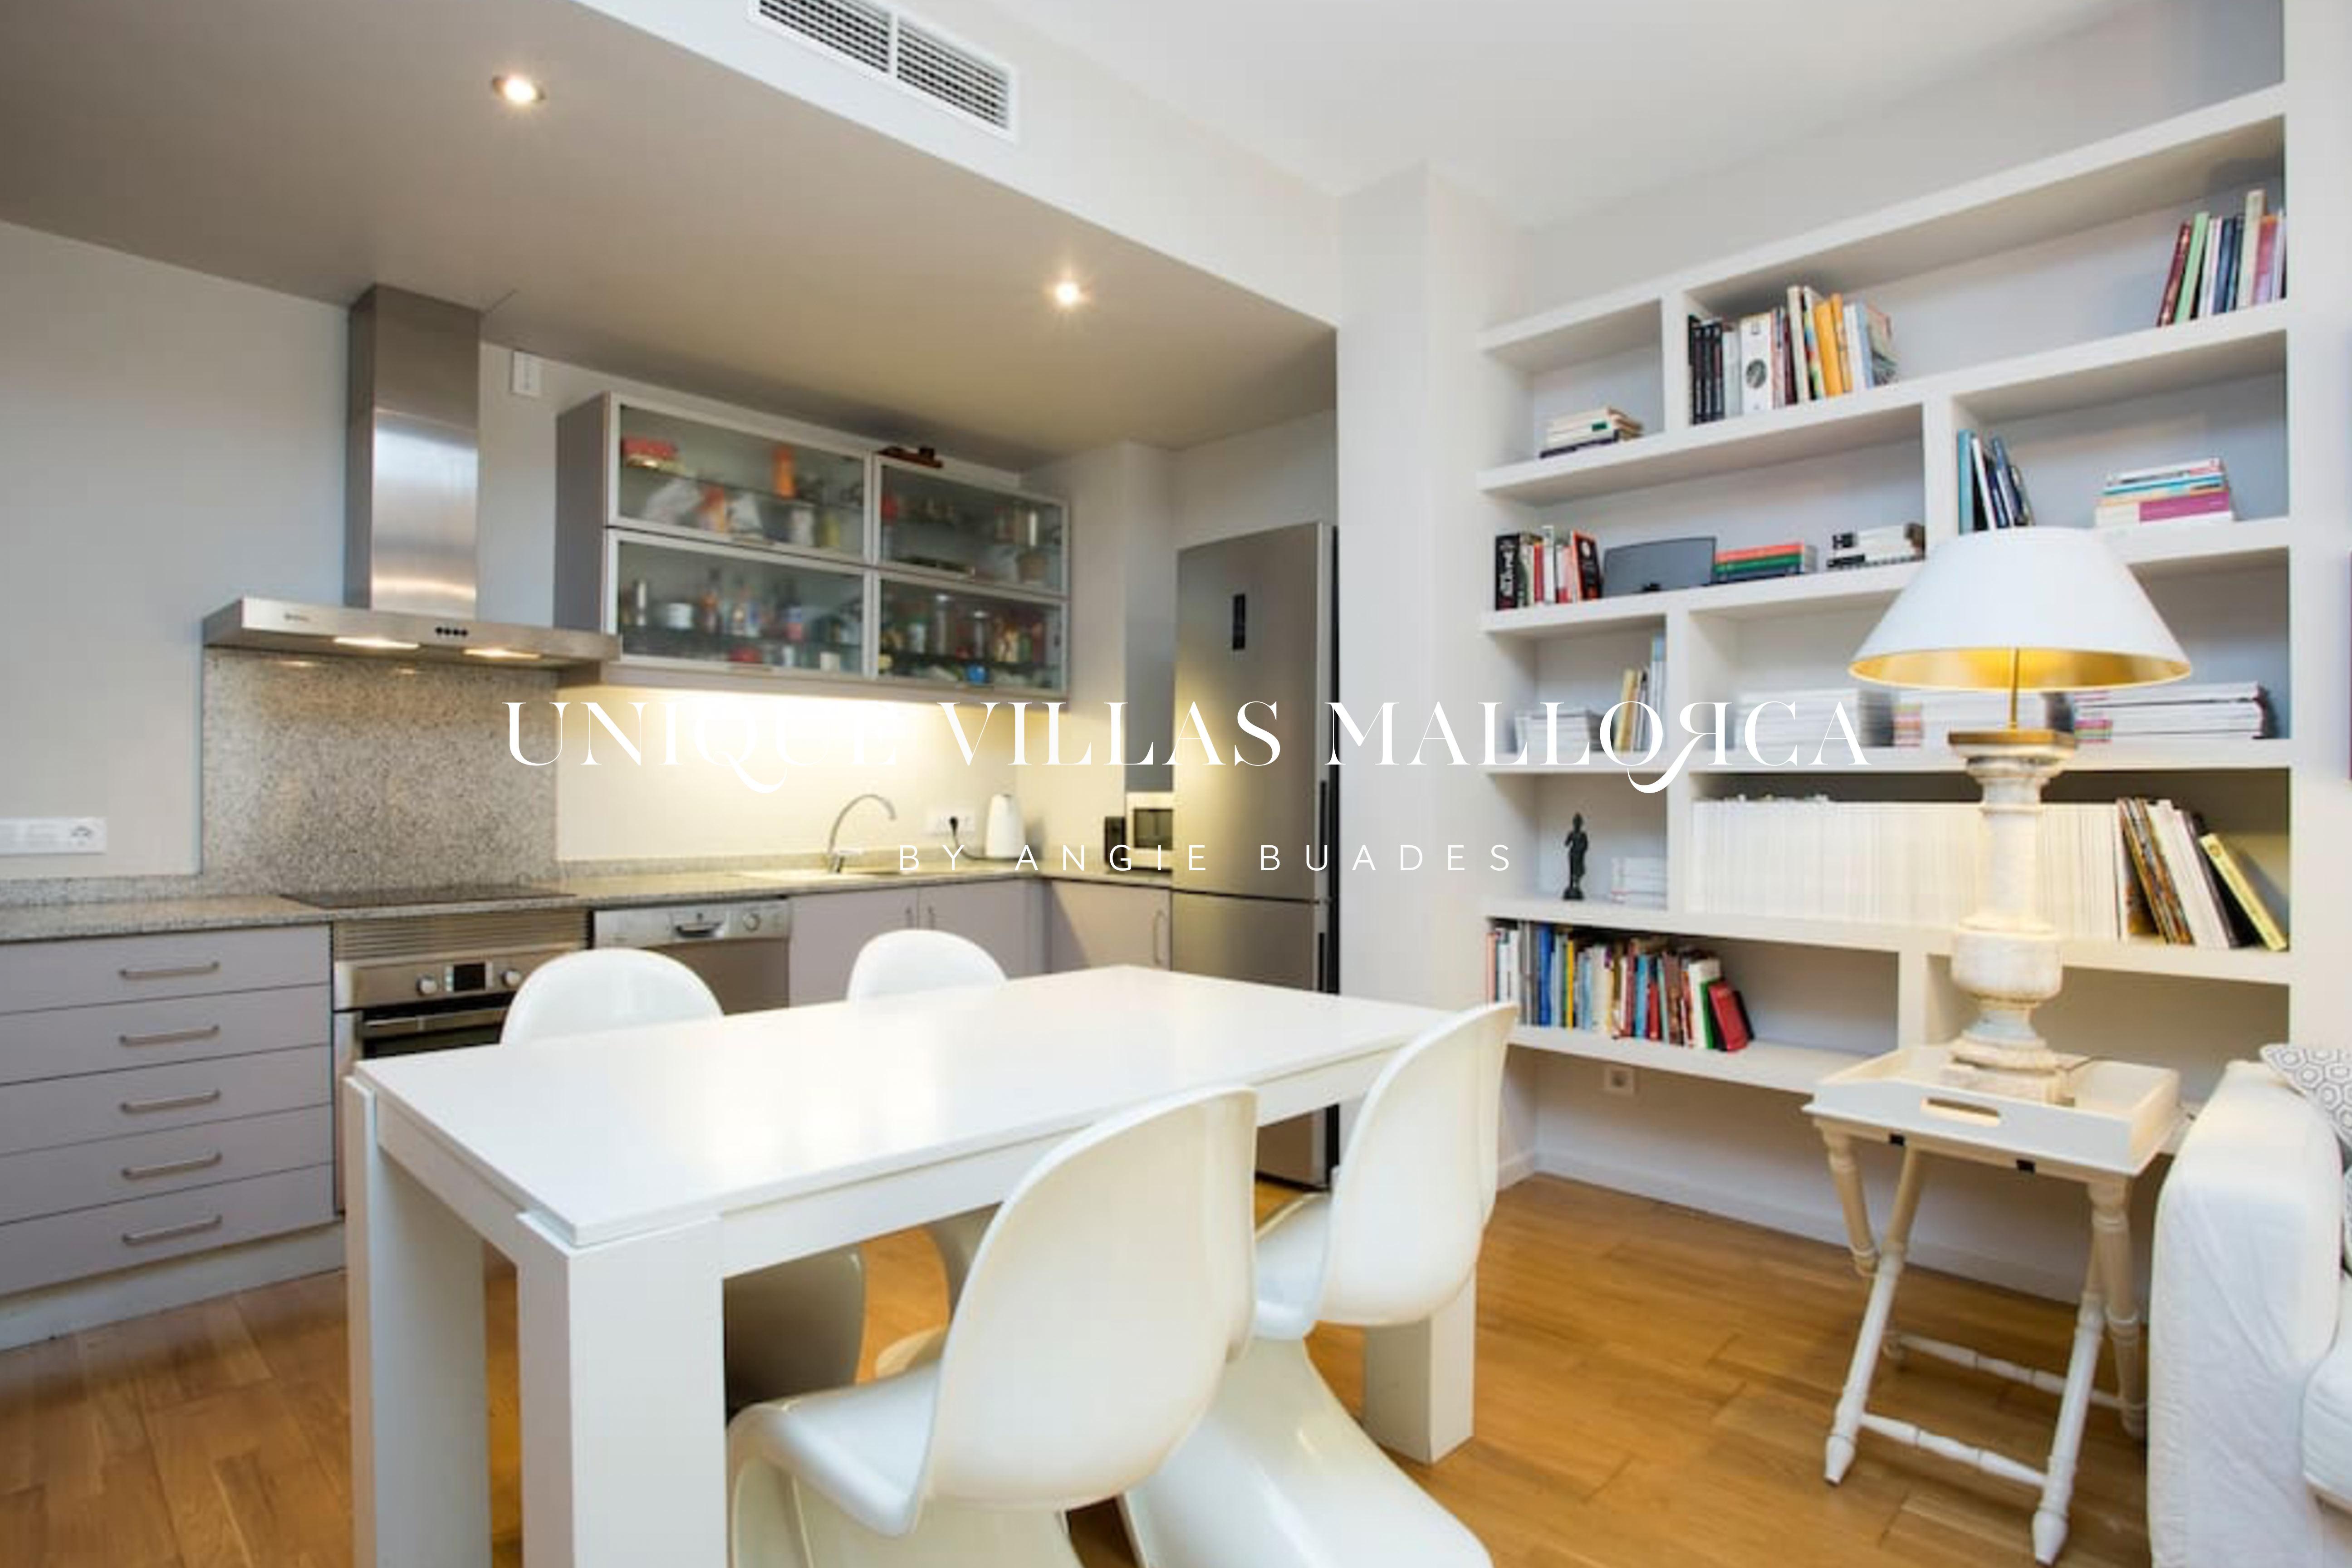 Coqueto Apartamento en Venta en Palma Centro-uvm220